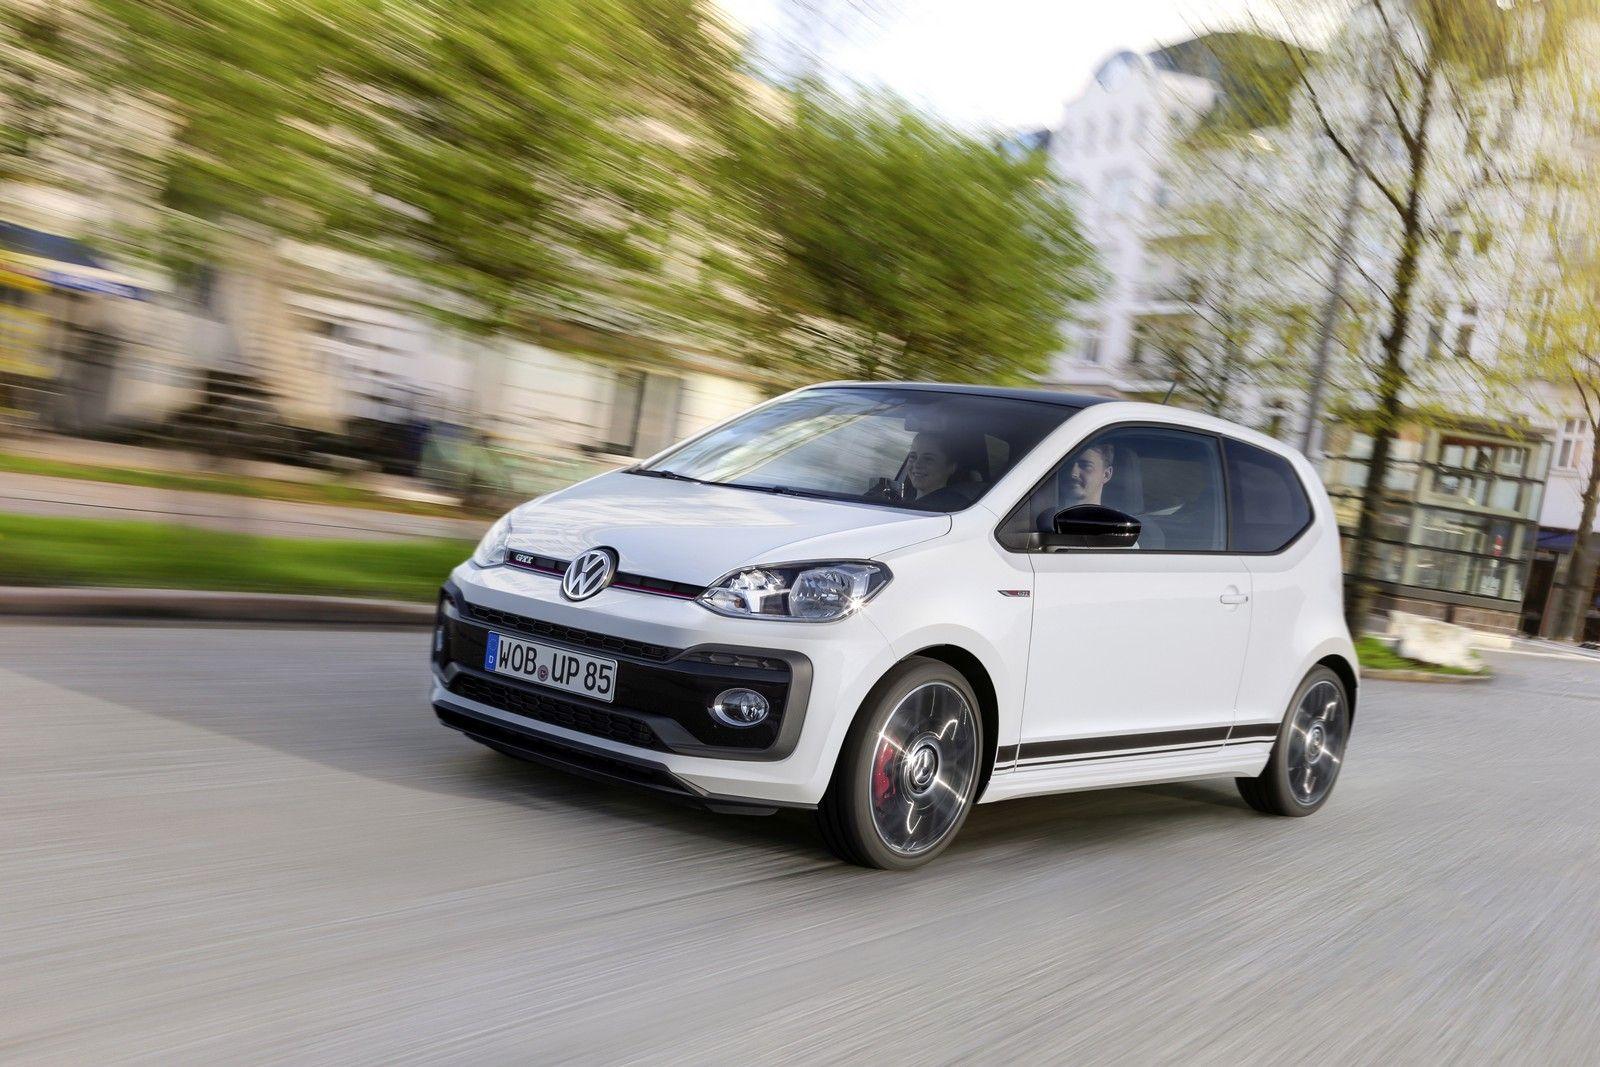 Vw Up Gti >> Vokswagen Up Gti Worthy Heiress Volkswagen Up Vw Up